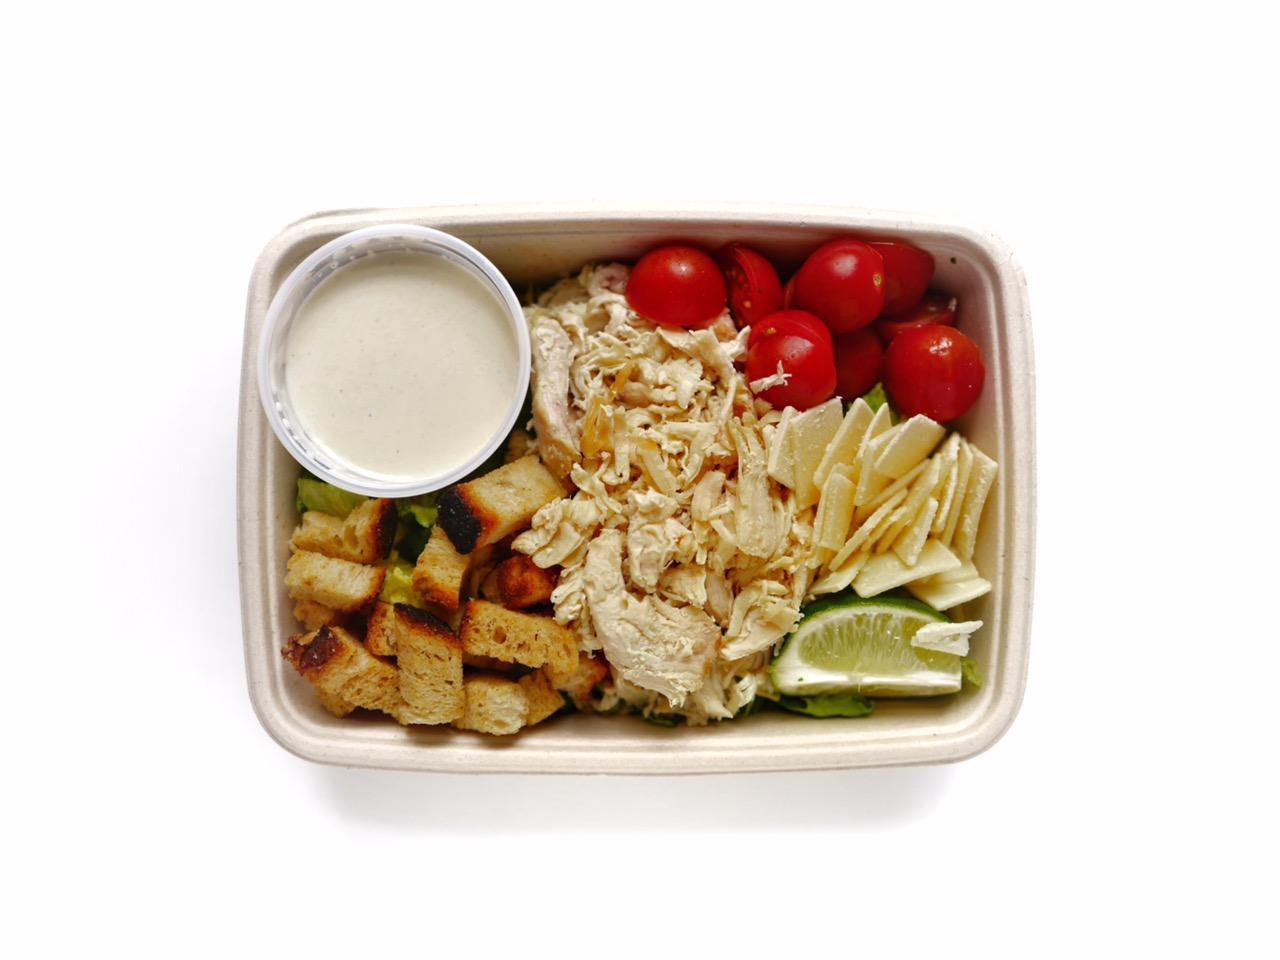 Ceasarsallad 105:- - Romansallad, kyckling, krutonger, parmesan, tomat, lime, ceasardressing,